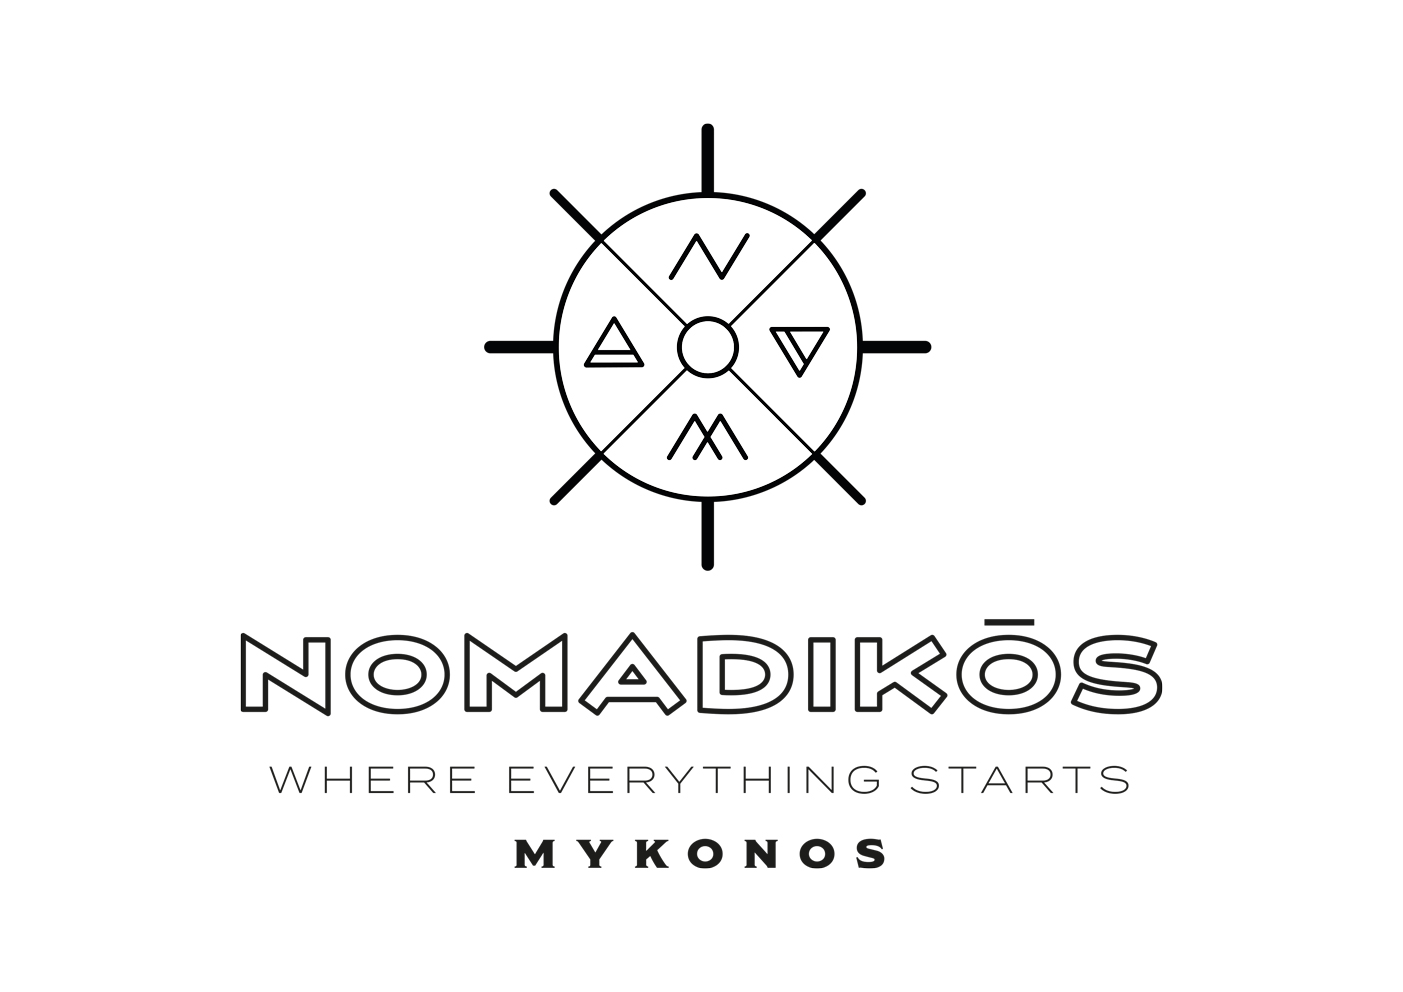 nomadikos_concept4.jpg